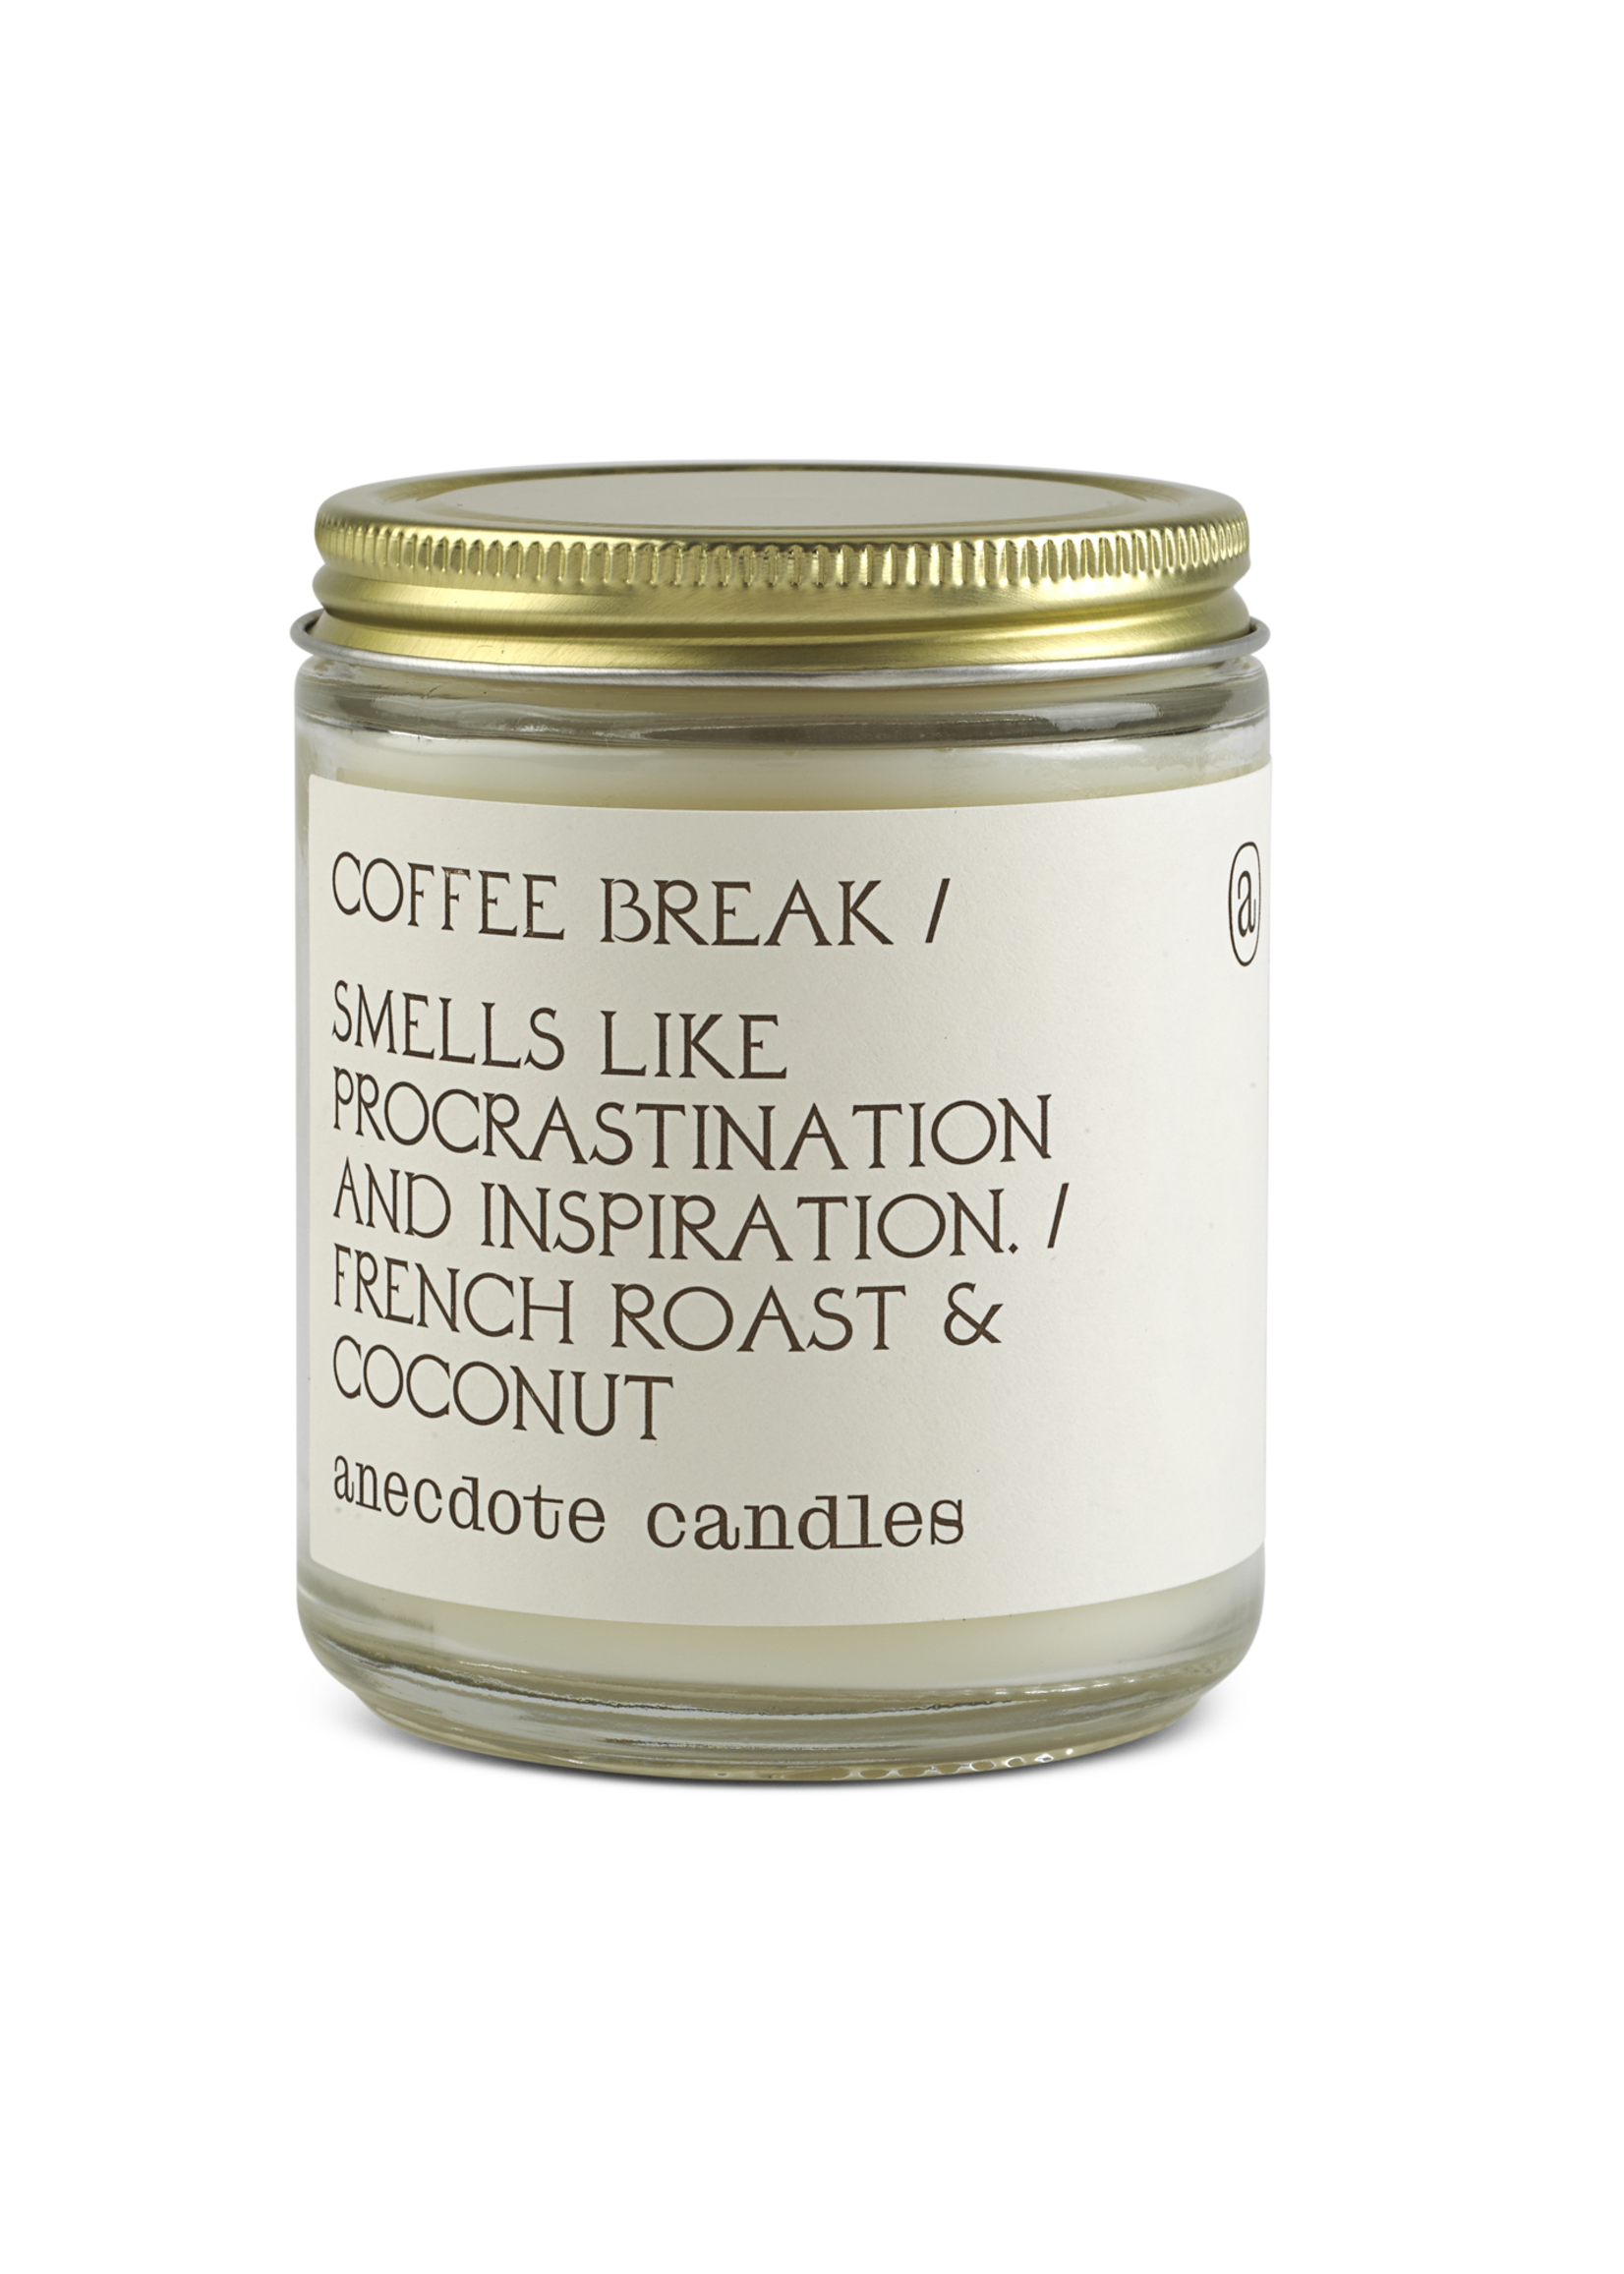 Coffee Break (French Roast & Coconut) Glass Jar Candle